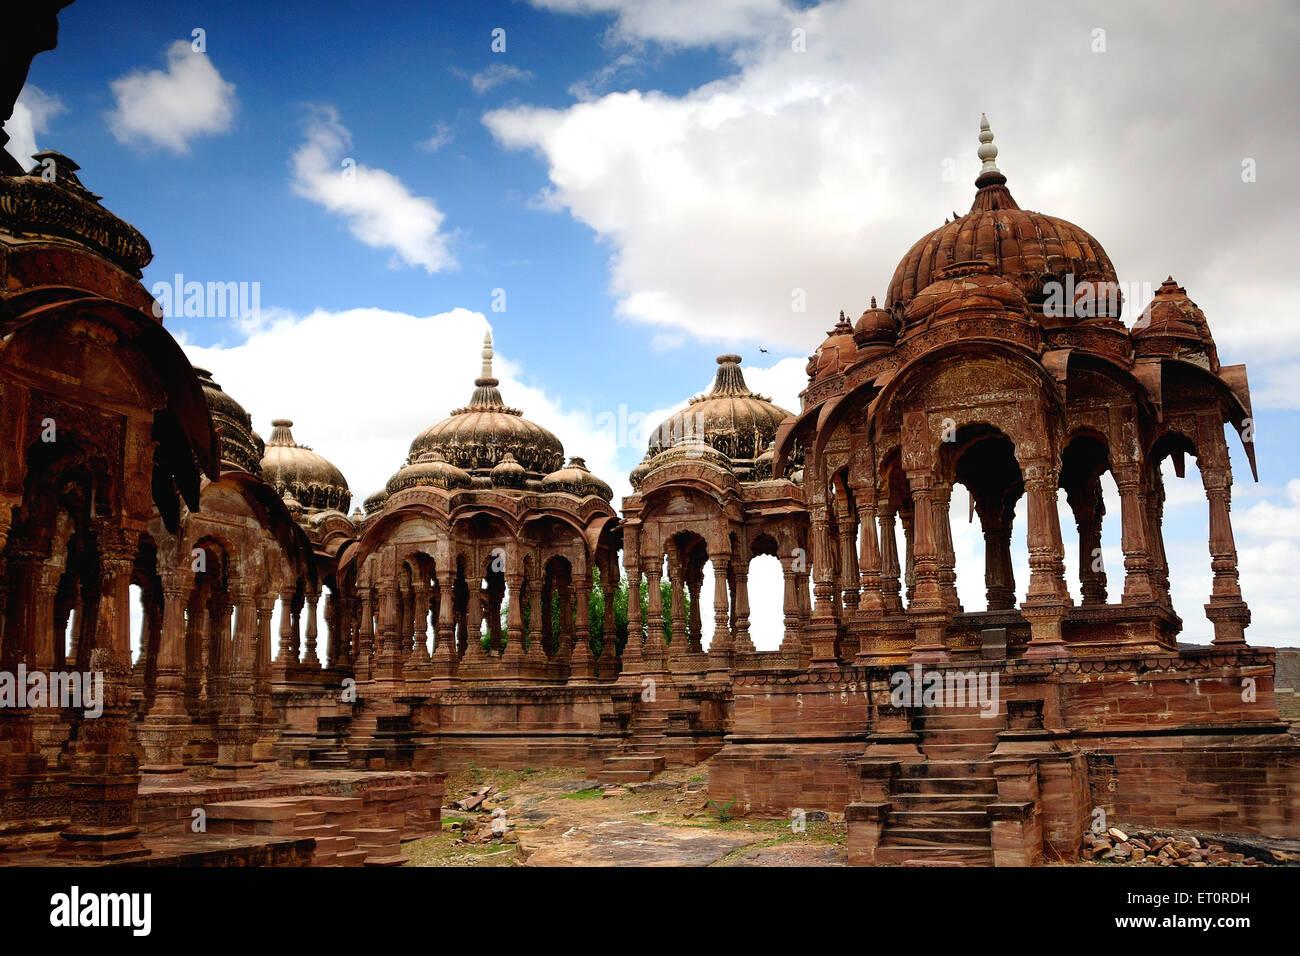 Cenotaphs di marwar rajput maharaja ; Jodhpur; Rajasthan ; India Immagini Stock